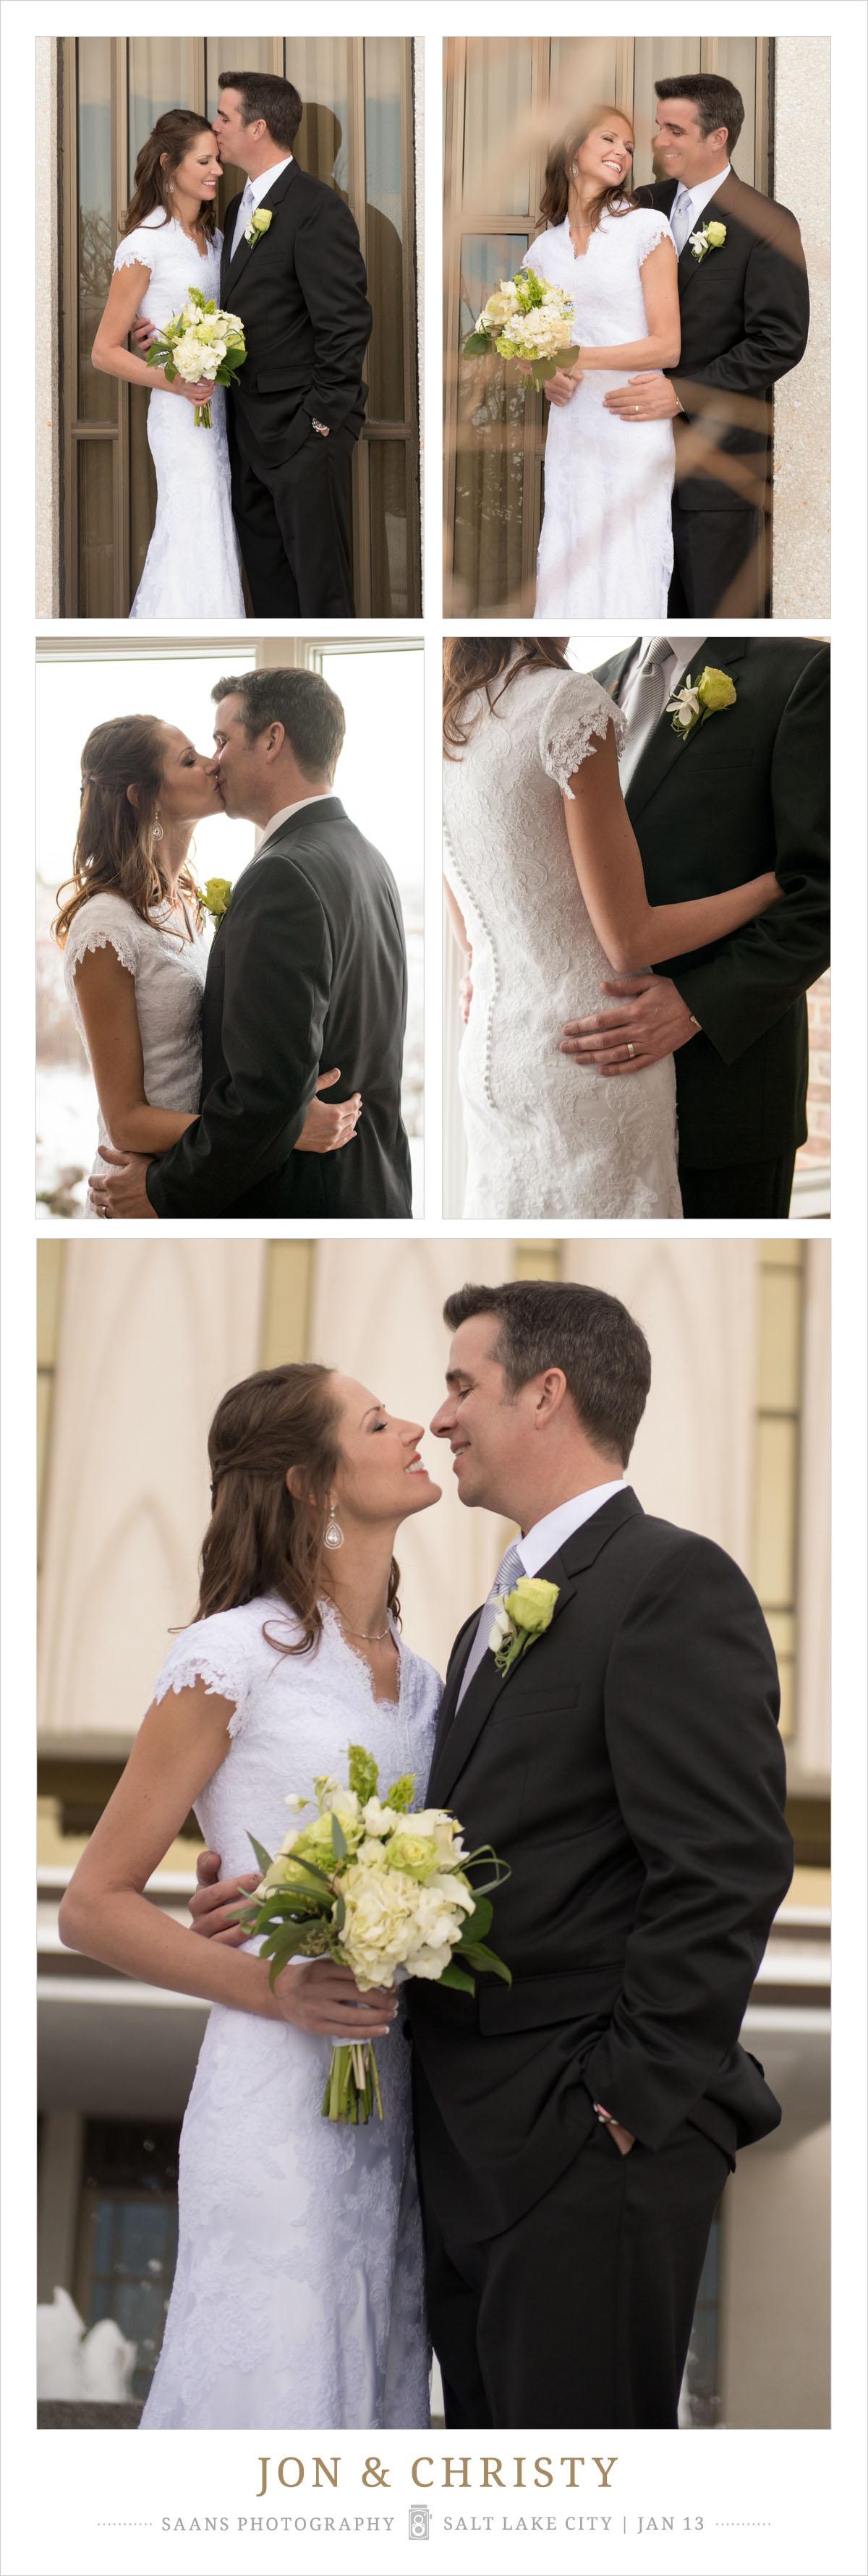 Jon and Christy Wedding